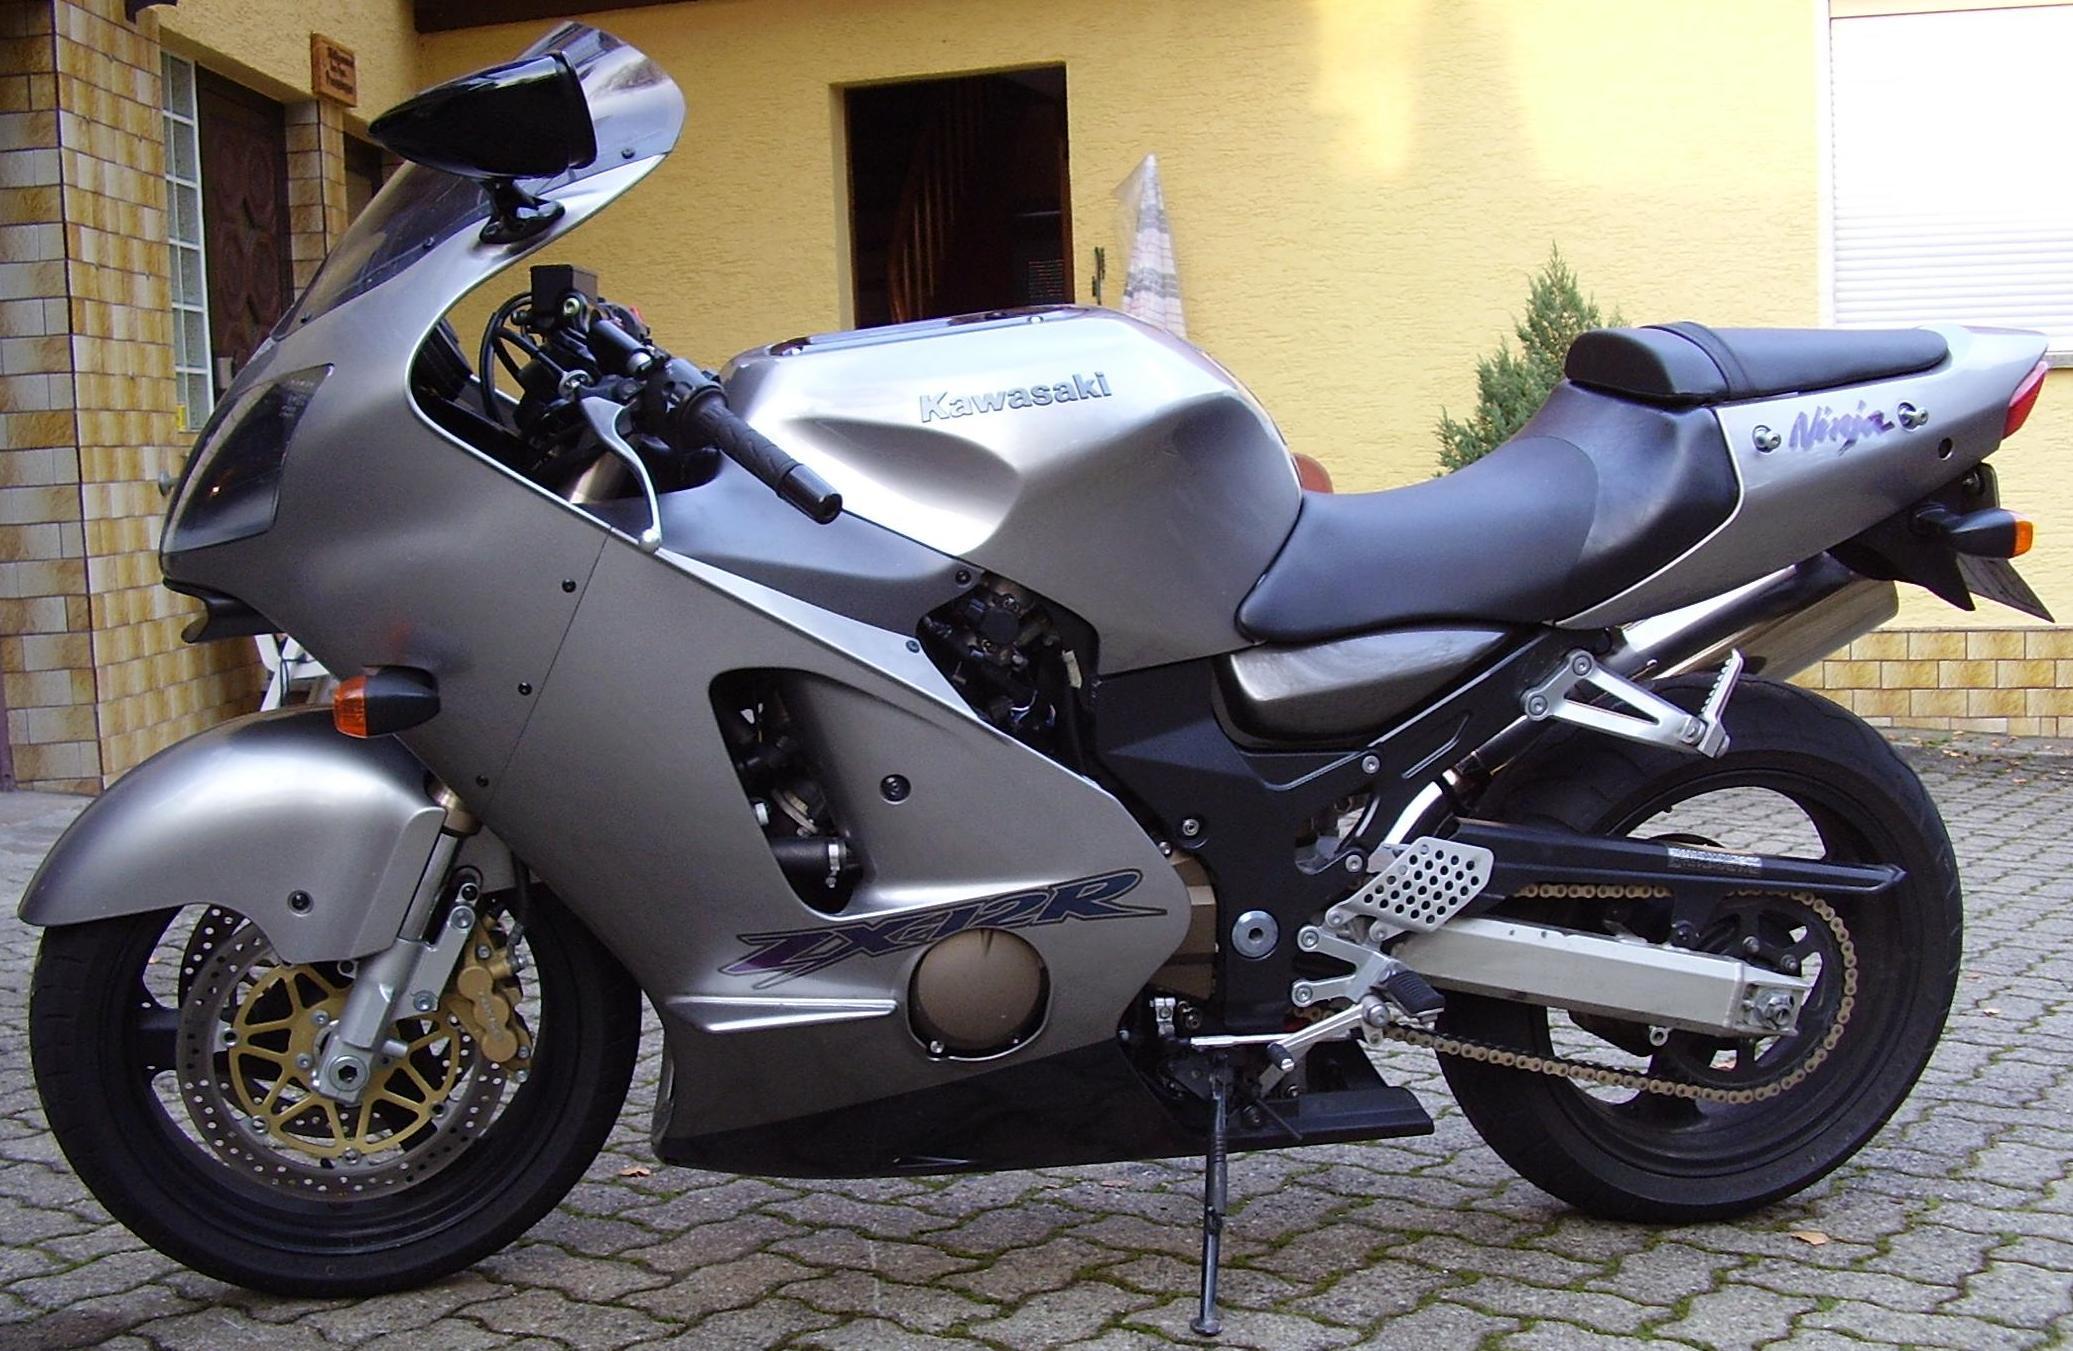 Kawasaki Zx R No Fuel In Cylinders Site Www Zxforums Com